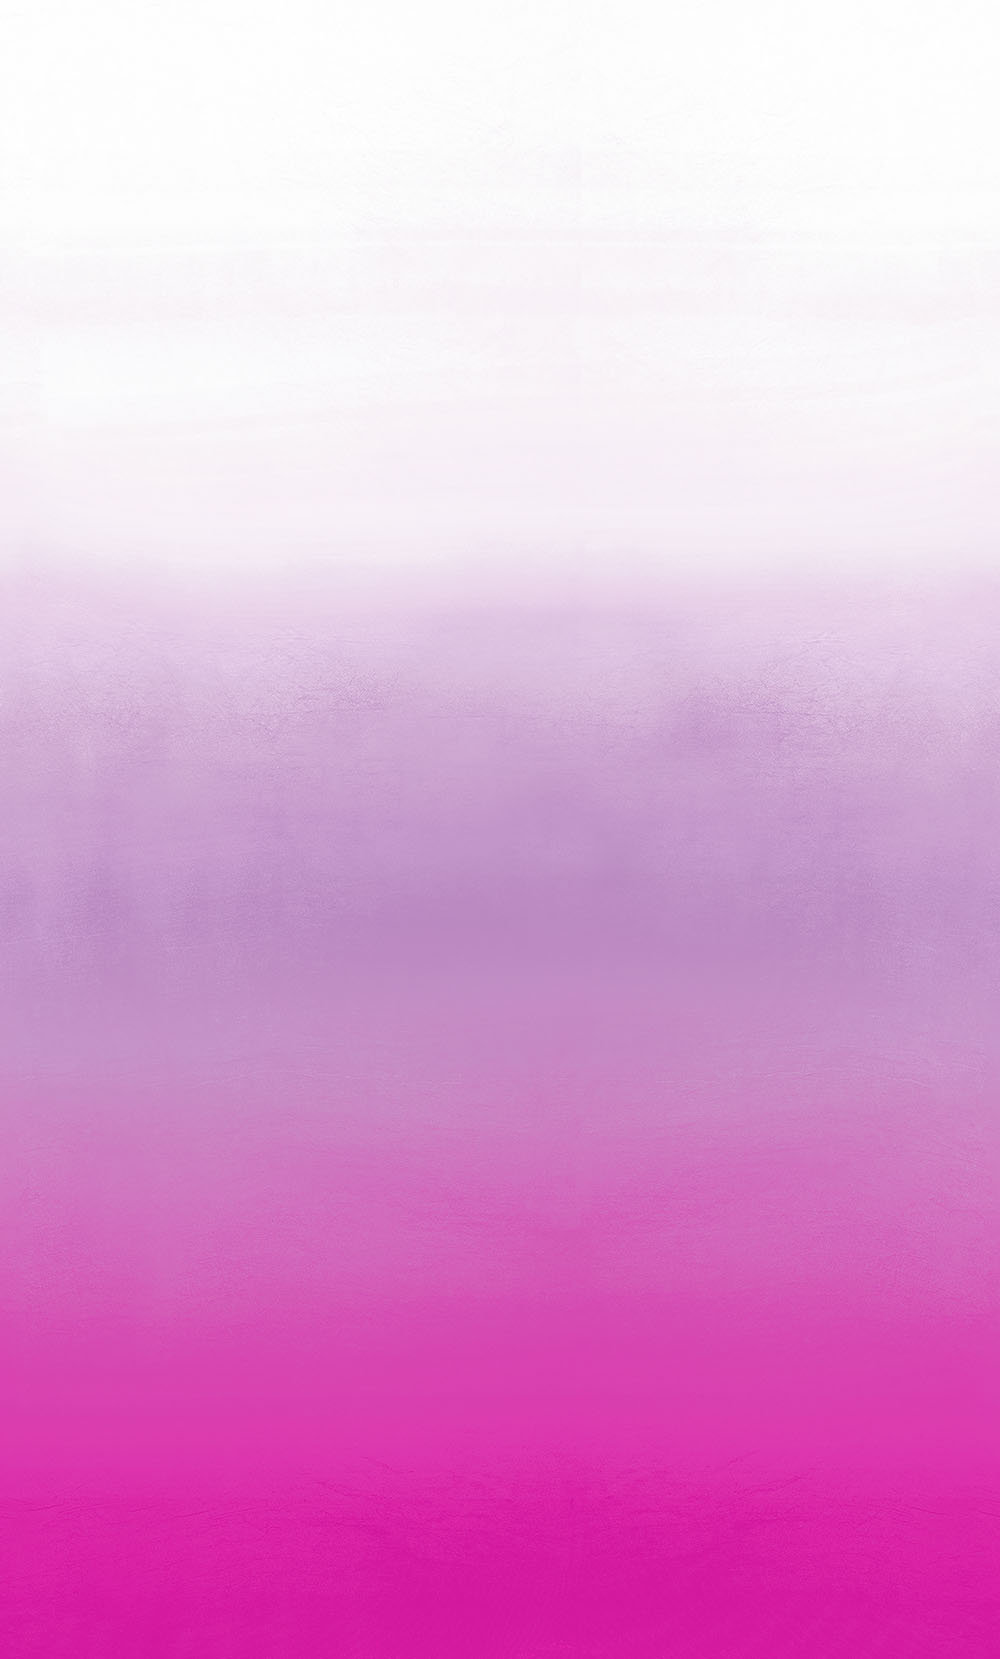 Savoie Mural - Fuchsia - by Designers Guild